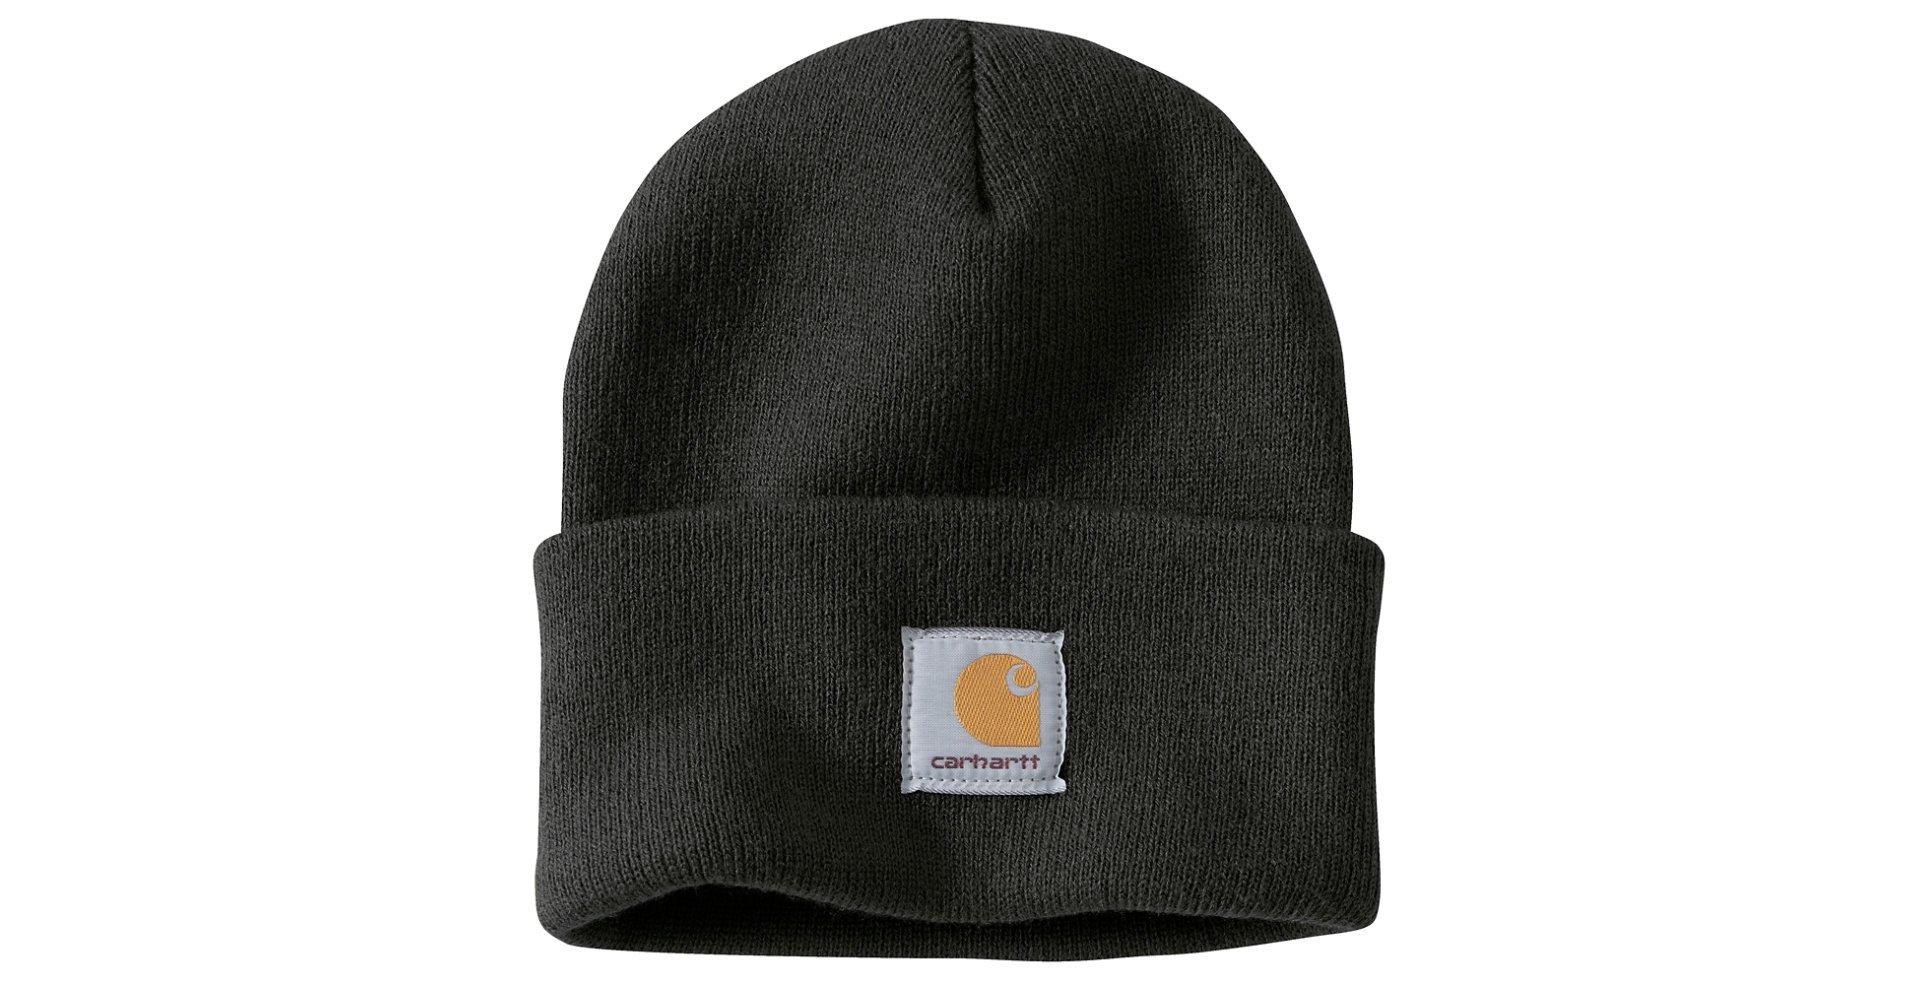 Carhartt A18 Beanie - Cappello invernale 98bff11ebe4c